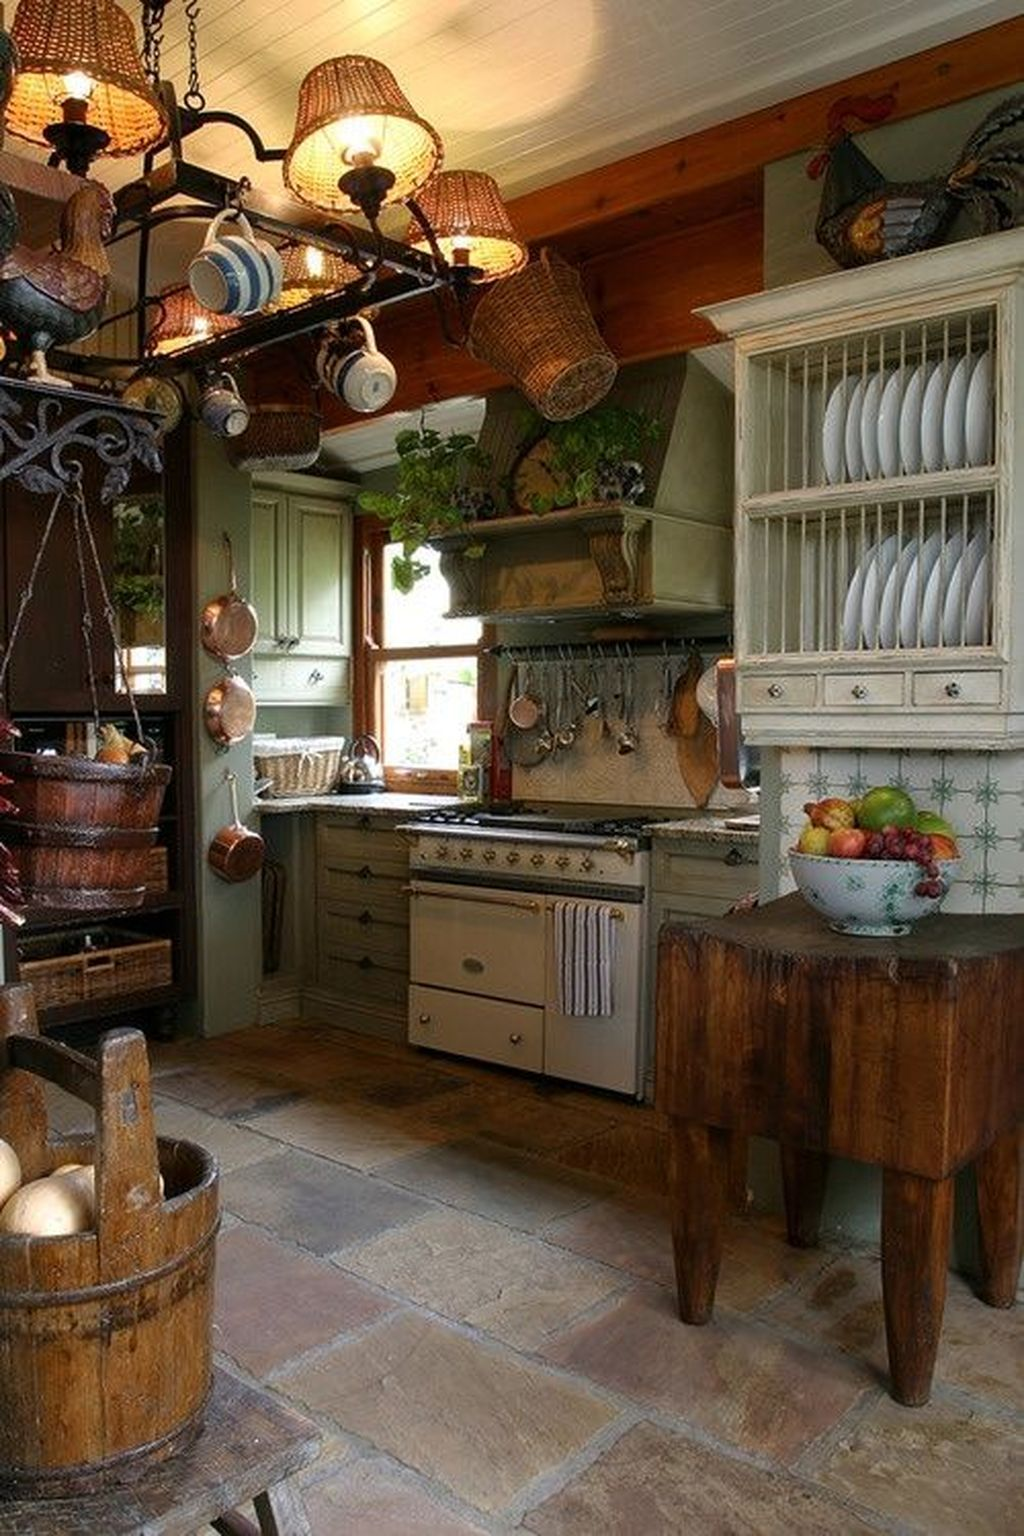 30 european cottage design inspirations rustic kitchen country kitchen french country kitchen on kitchen decor themes rustic id=70769